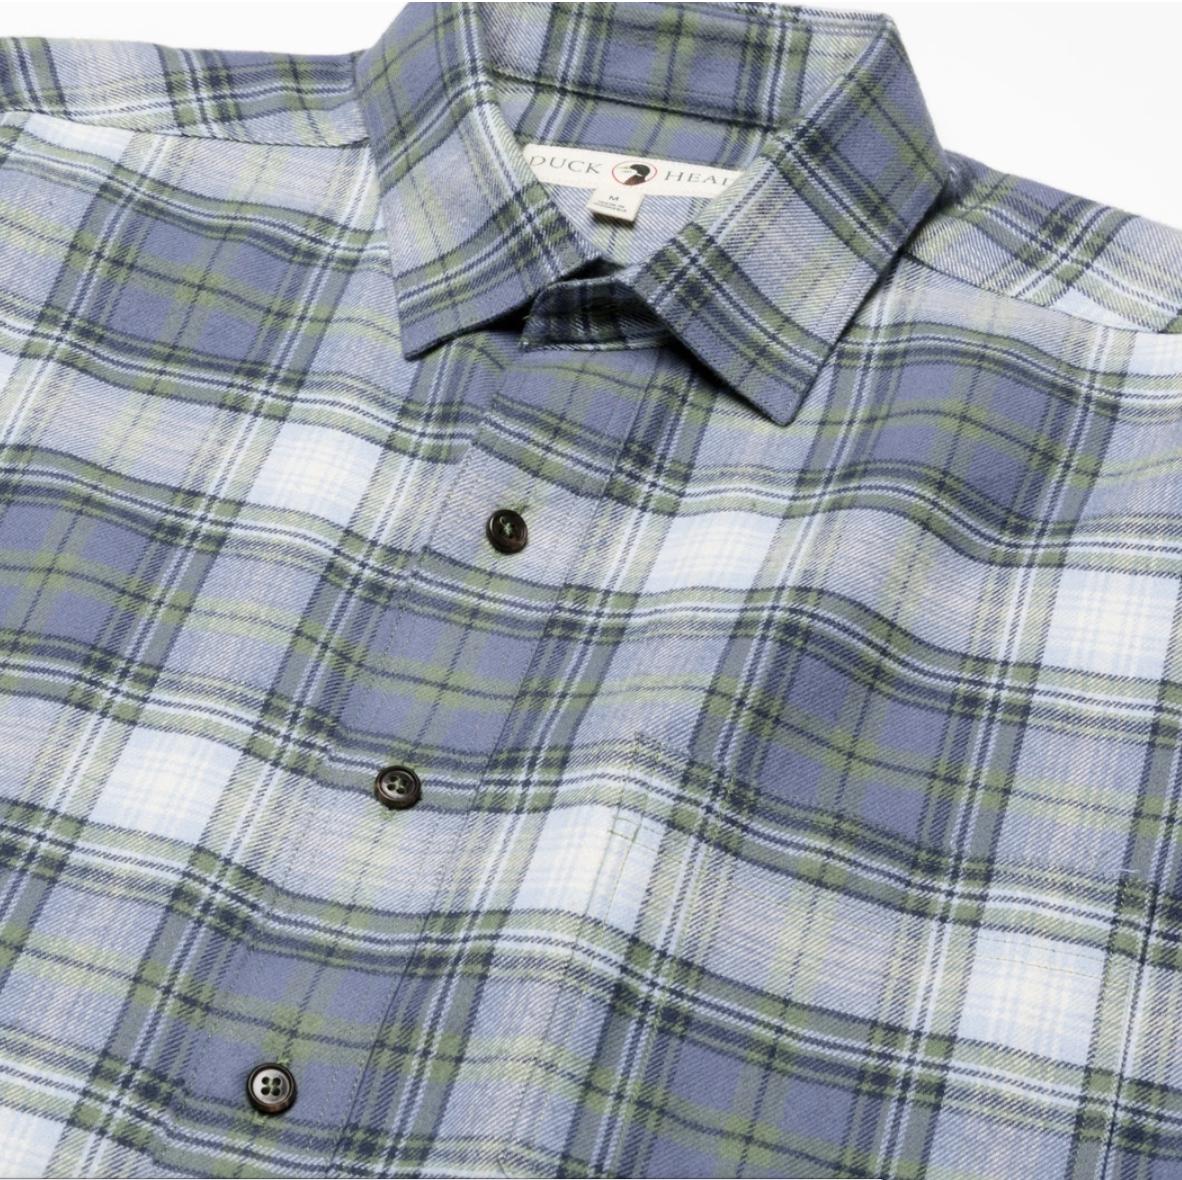 Duck Head Plainfield Plaid Flannel Shirt